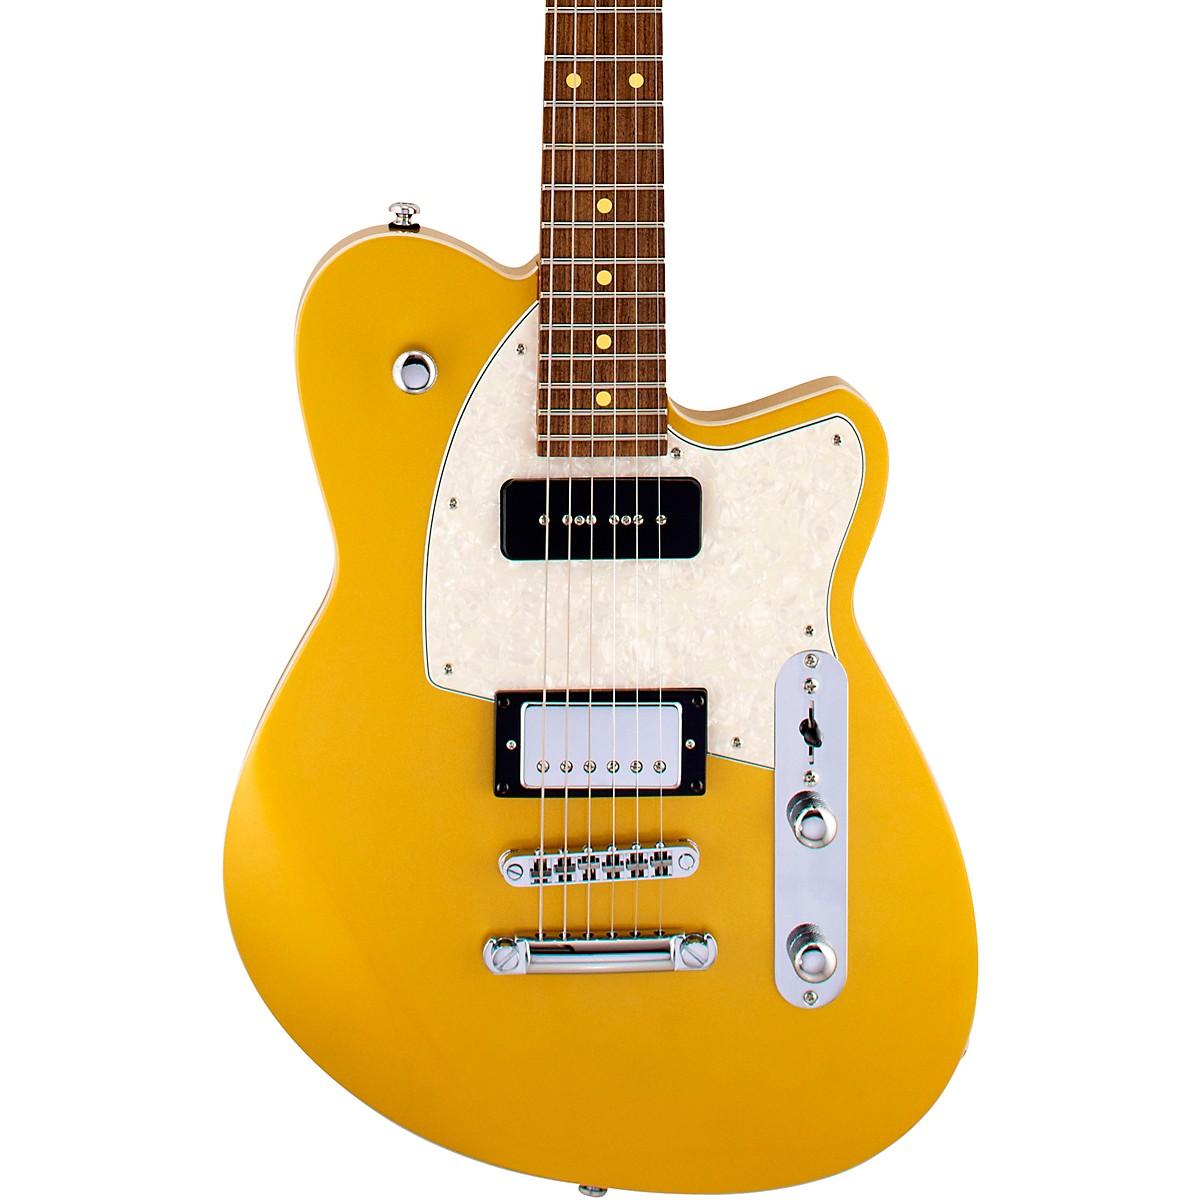 Reverend Double Agent OG Roasted Pau Ferro Fingerboard Electric Guitar